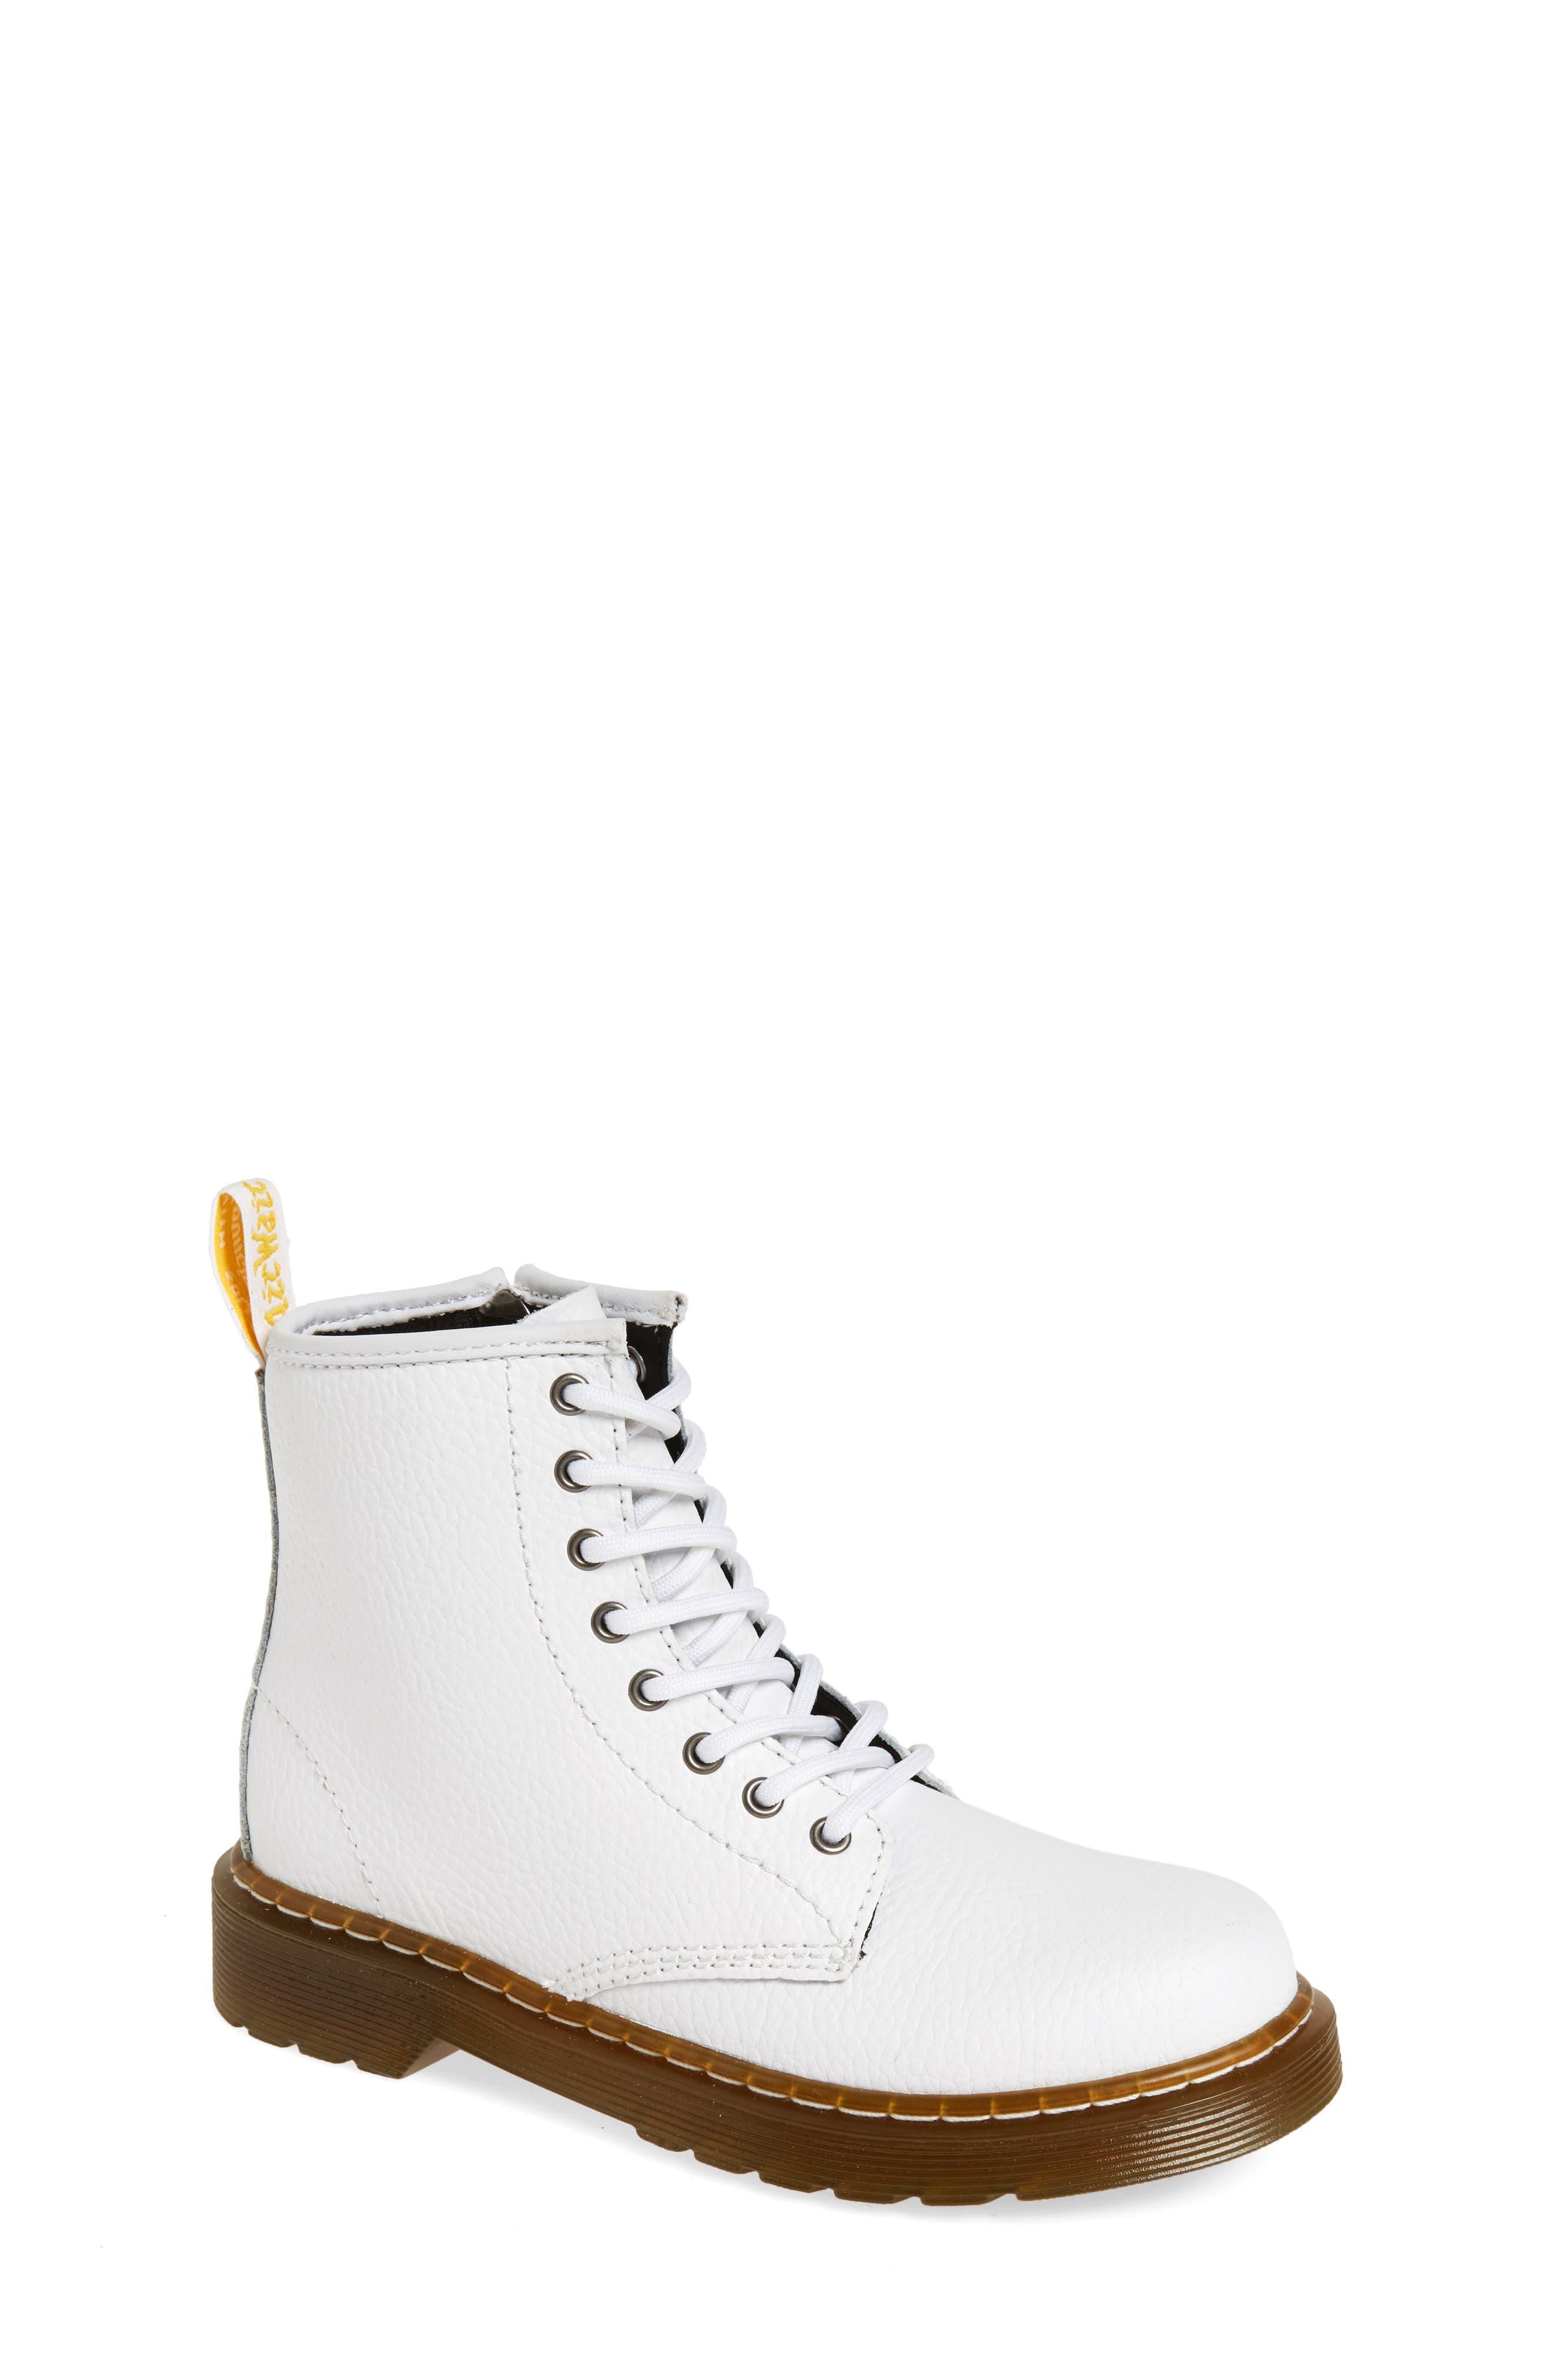 Delaney Pebbled Boot,                             Main thumbnail 1, color,                             White Pebble Leather